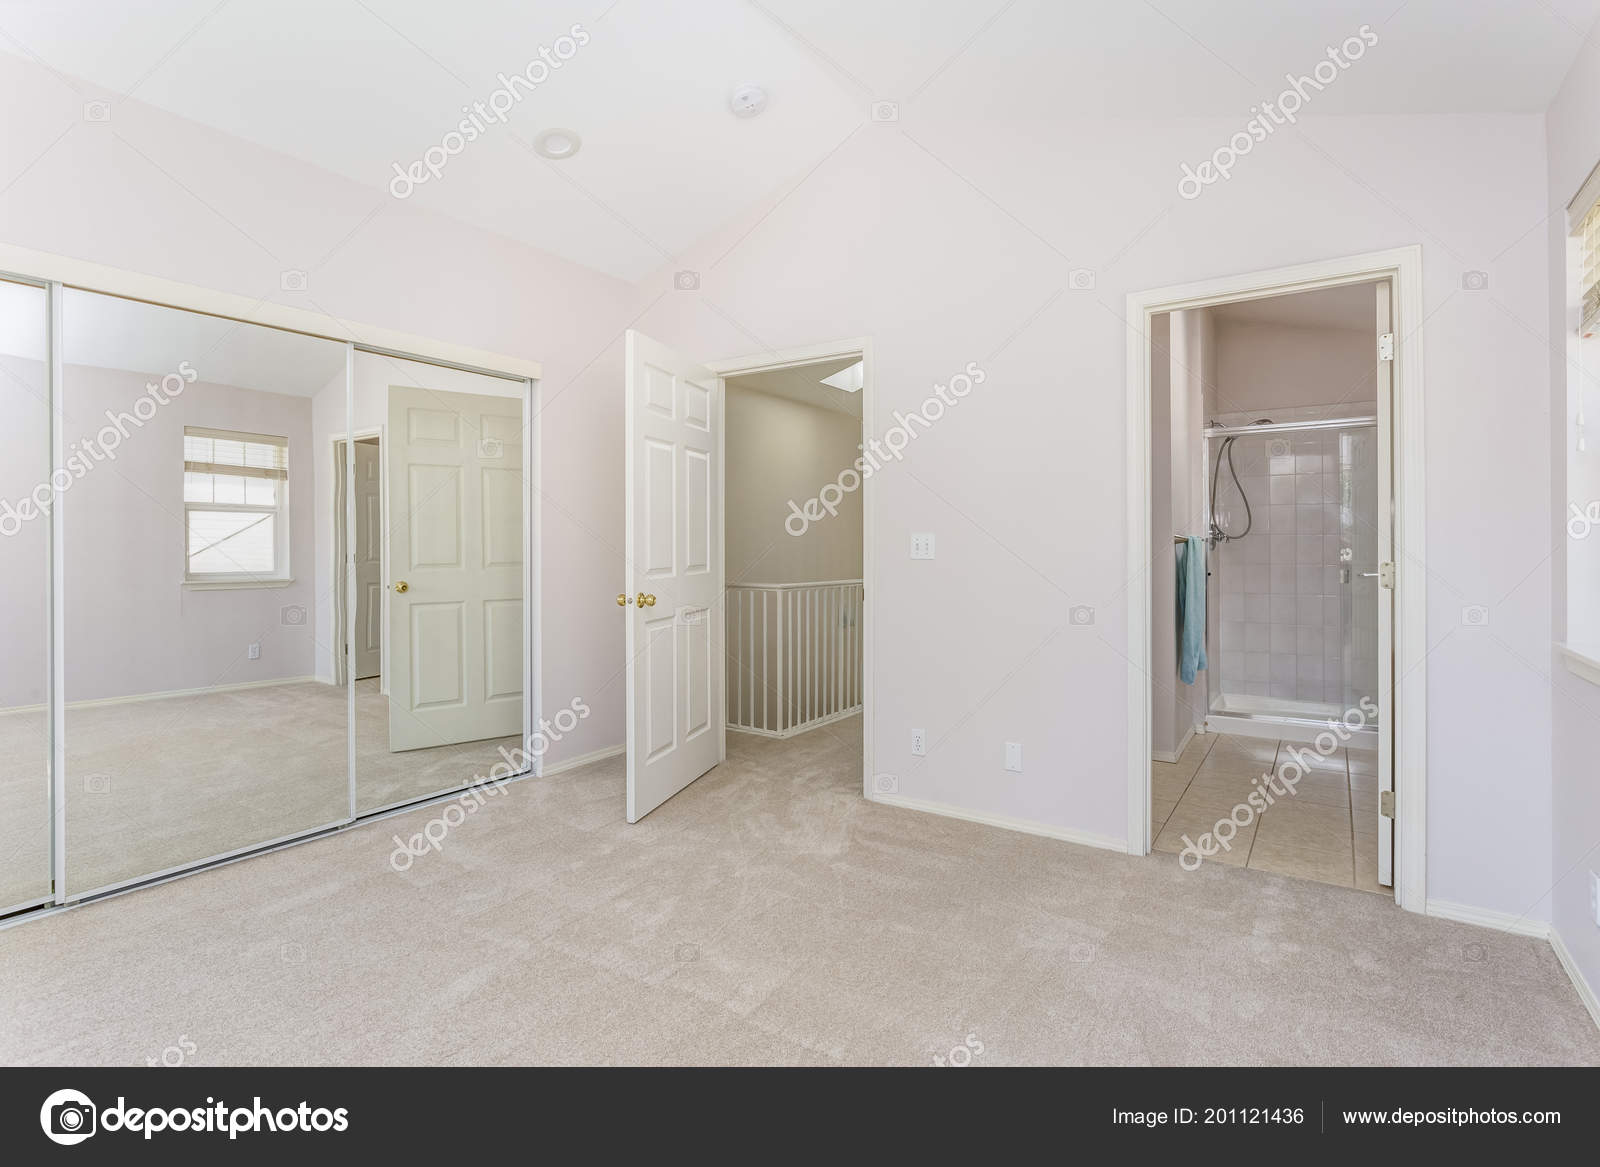 Lege licht gevulde slaapkamer met gewelfd plafond kast badkamer